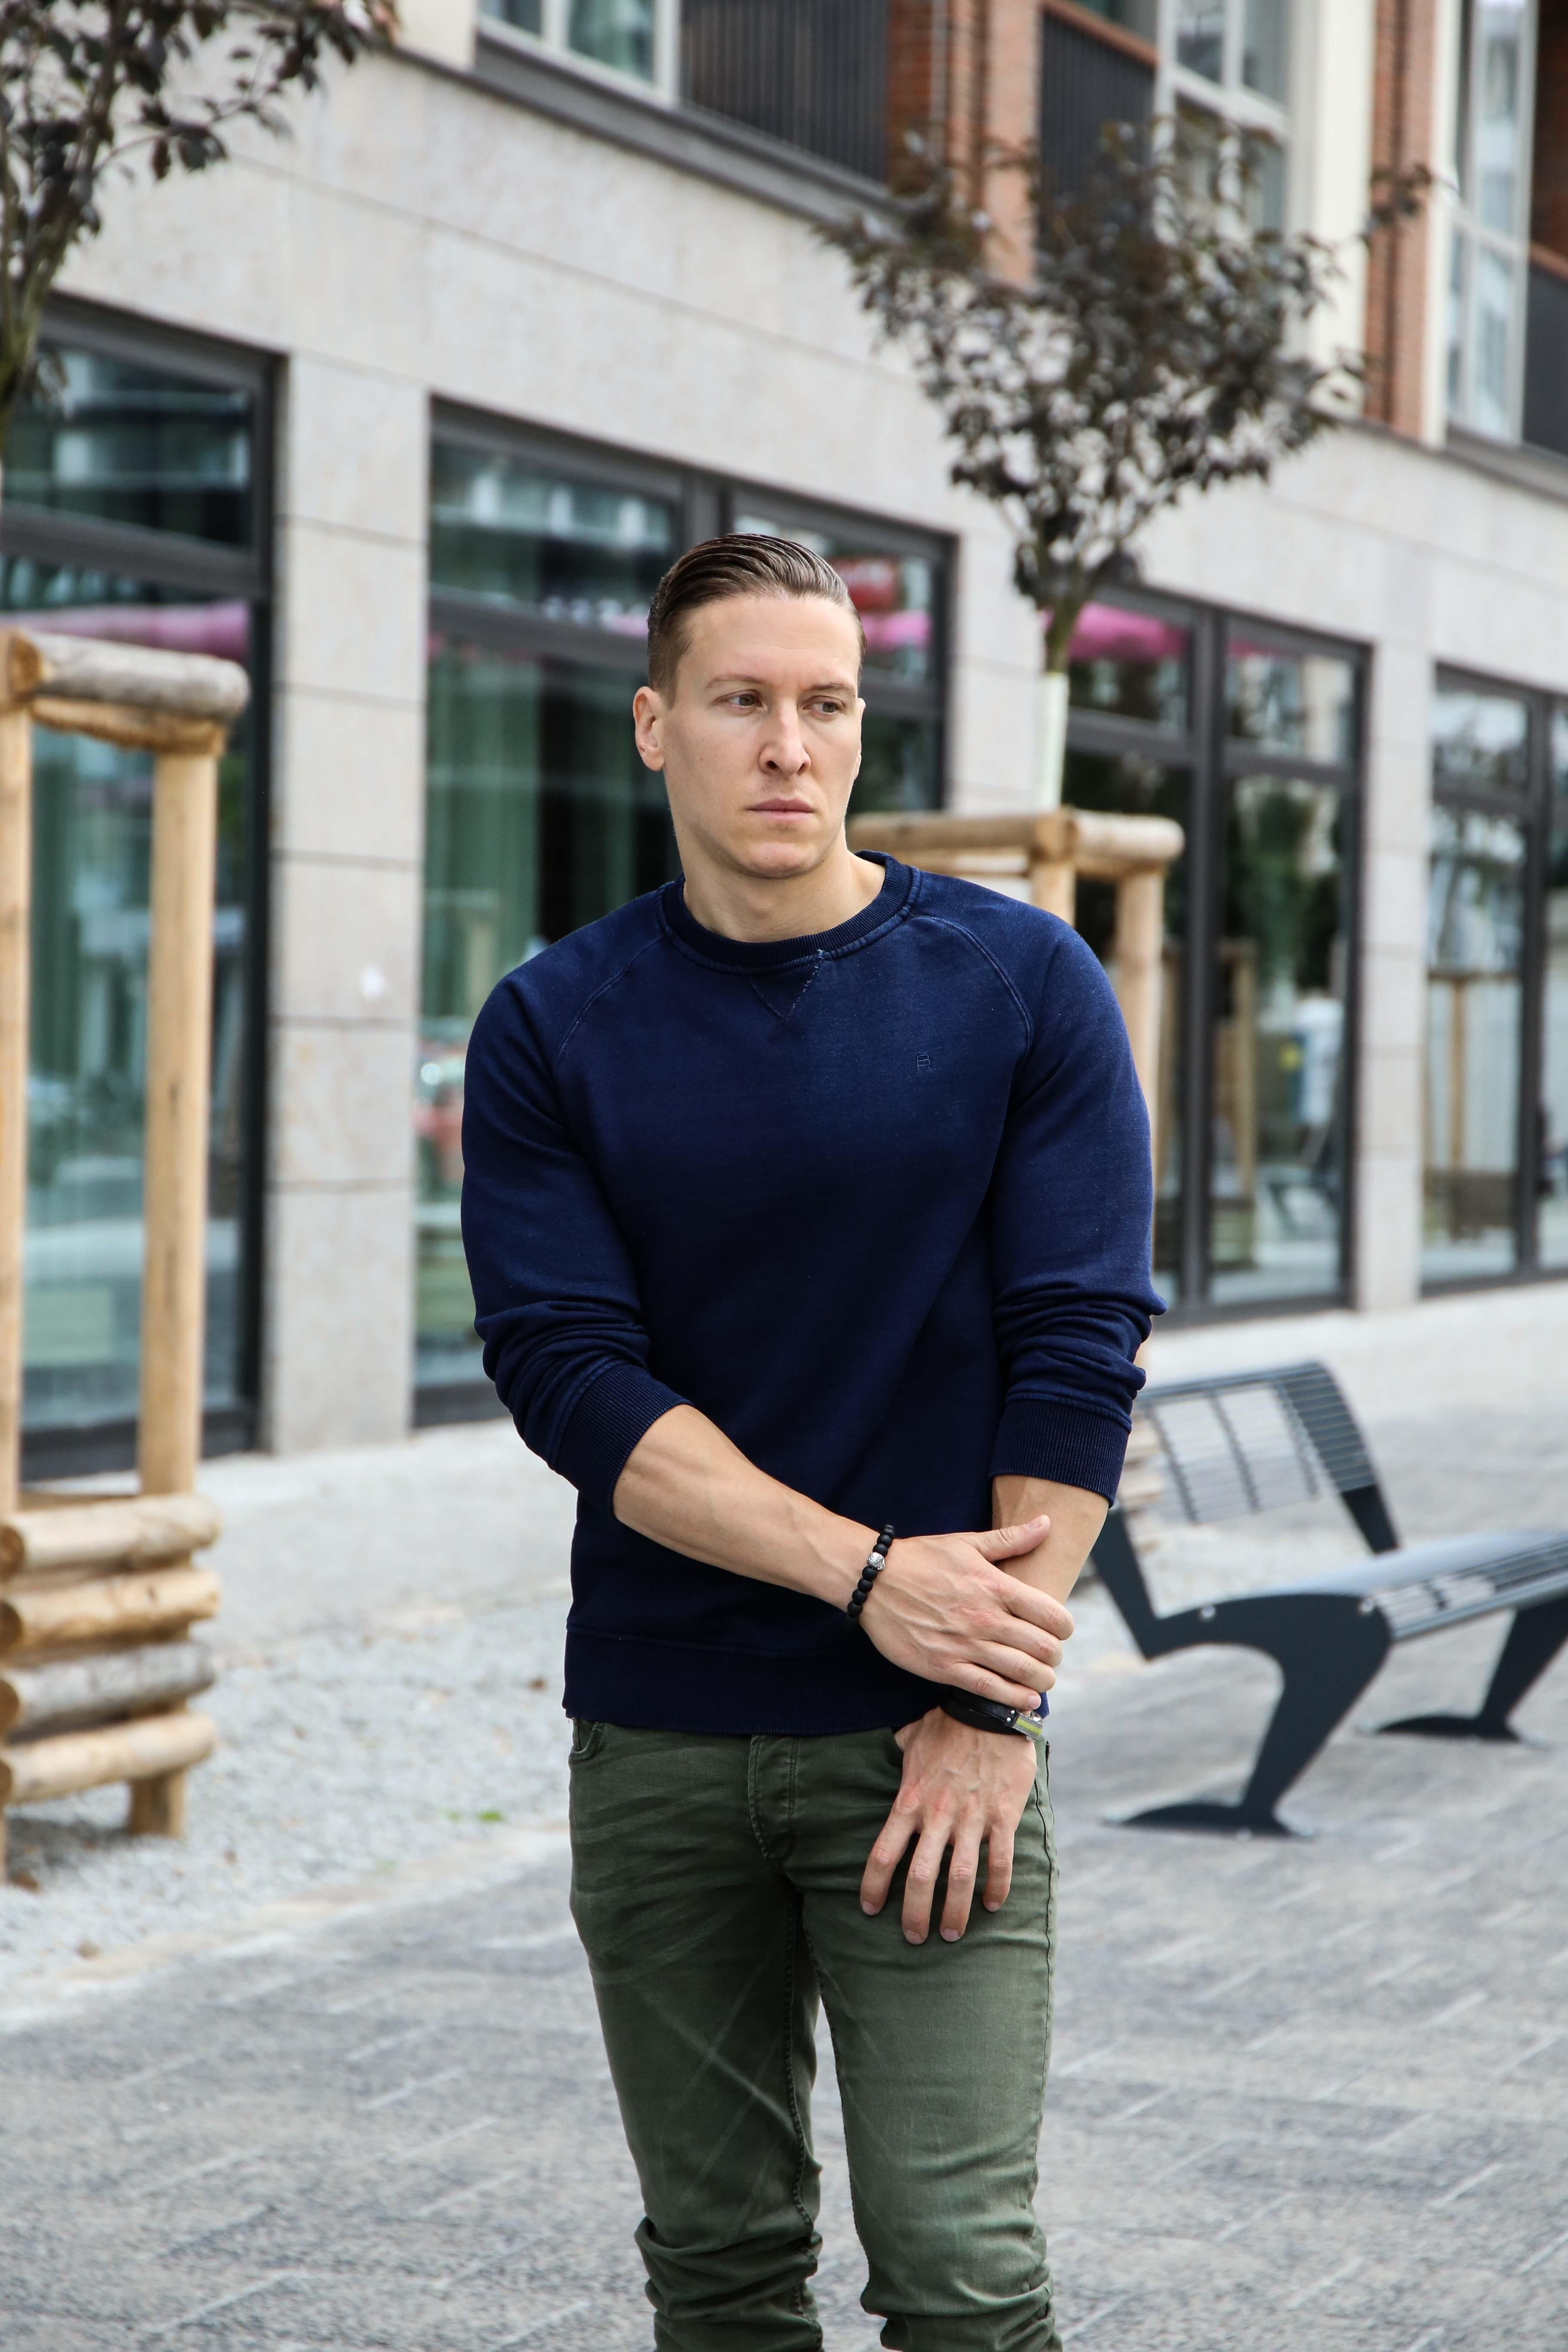 herbst-look-sweatshirt-indigo-blau-washed-skinny-jeans-grün-modeblog-männerblog-berlin_0112